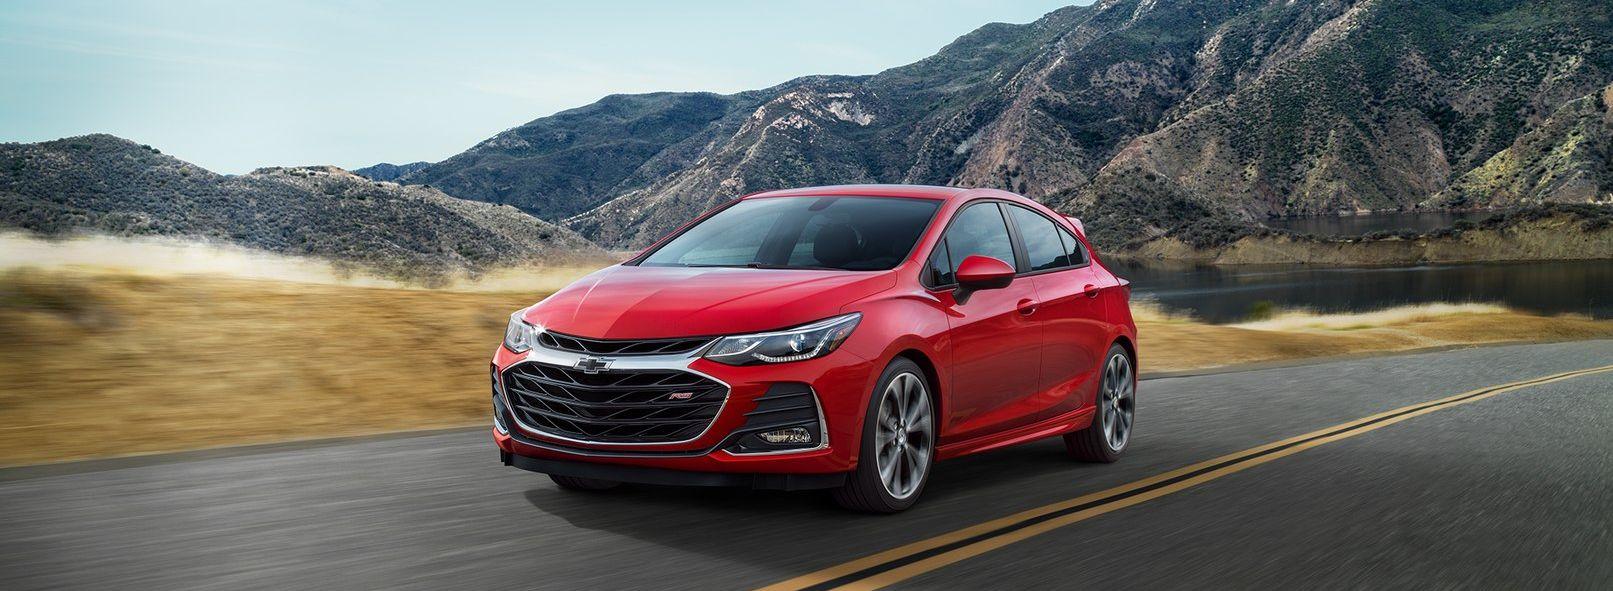 Chevrolet Cruze 2019 a la venta cerca de Manassas, VA